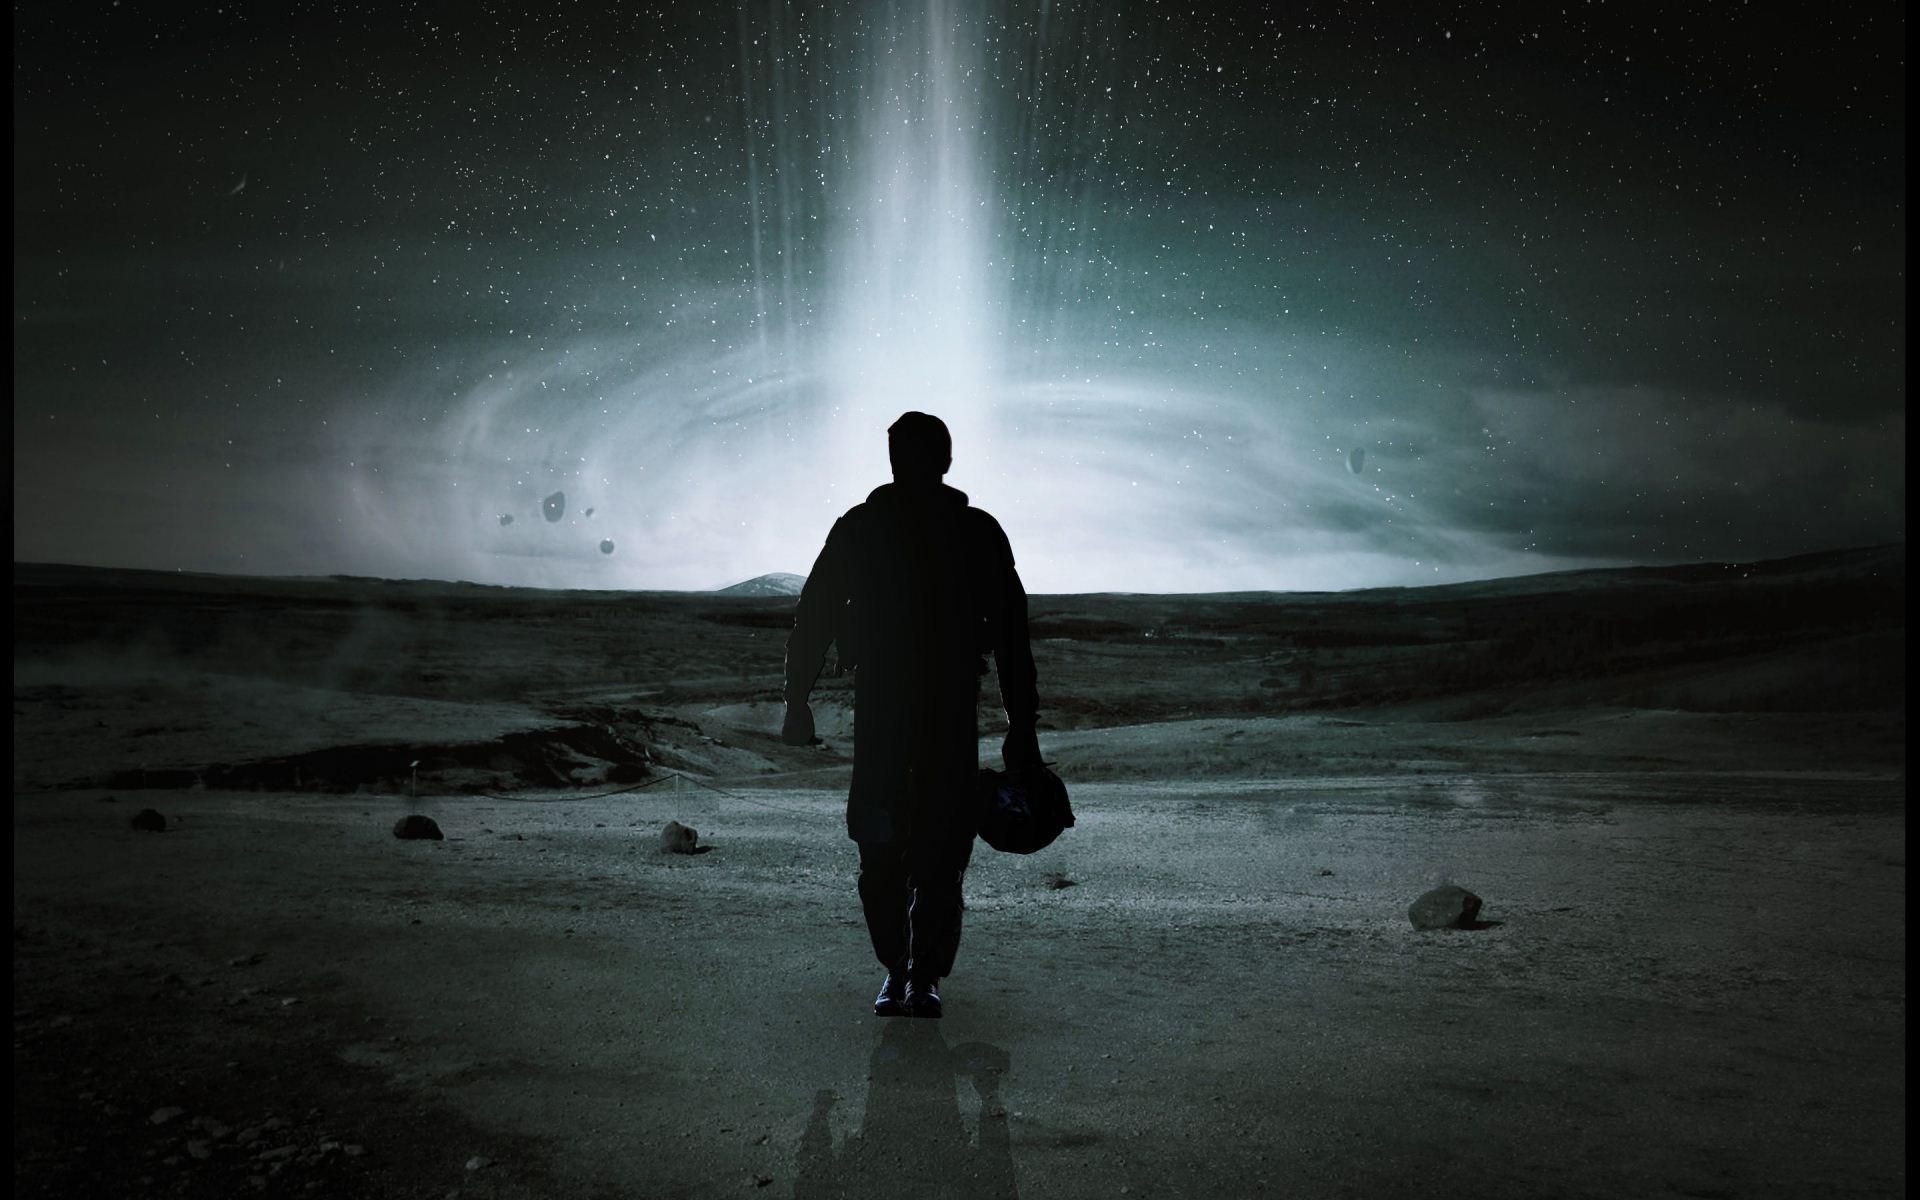 interstellar cosa vedere al cinema